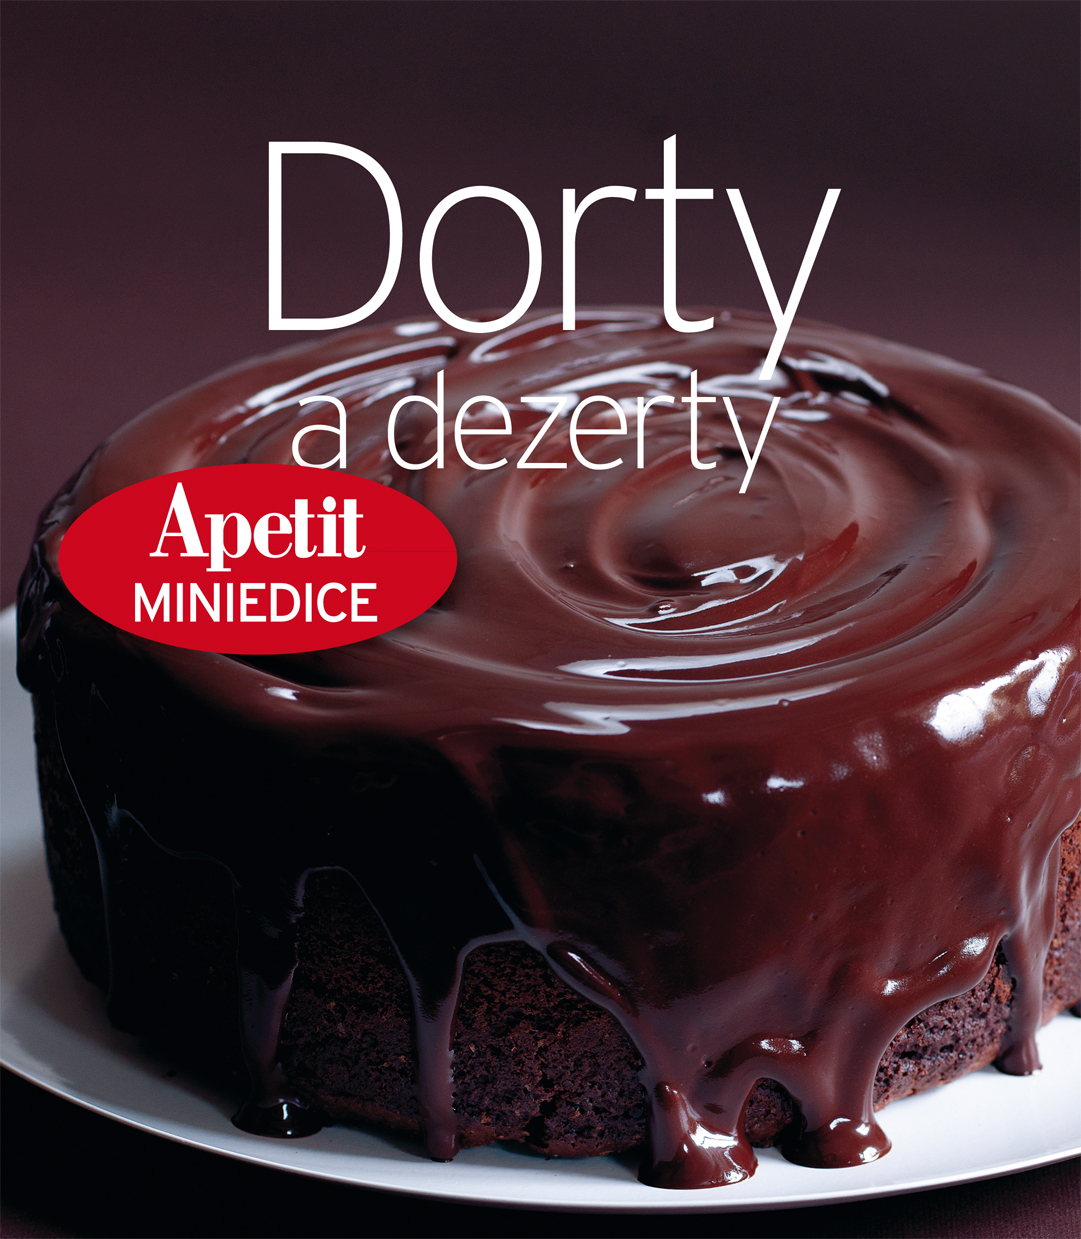 Dorty a dezerty - Apetit miniedice